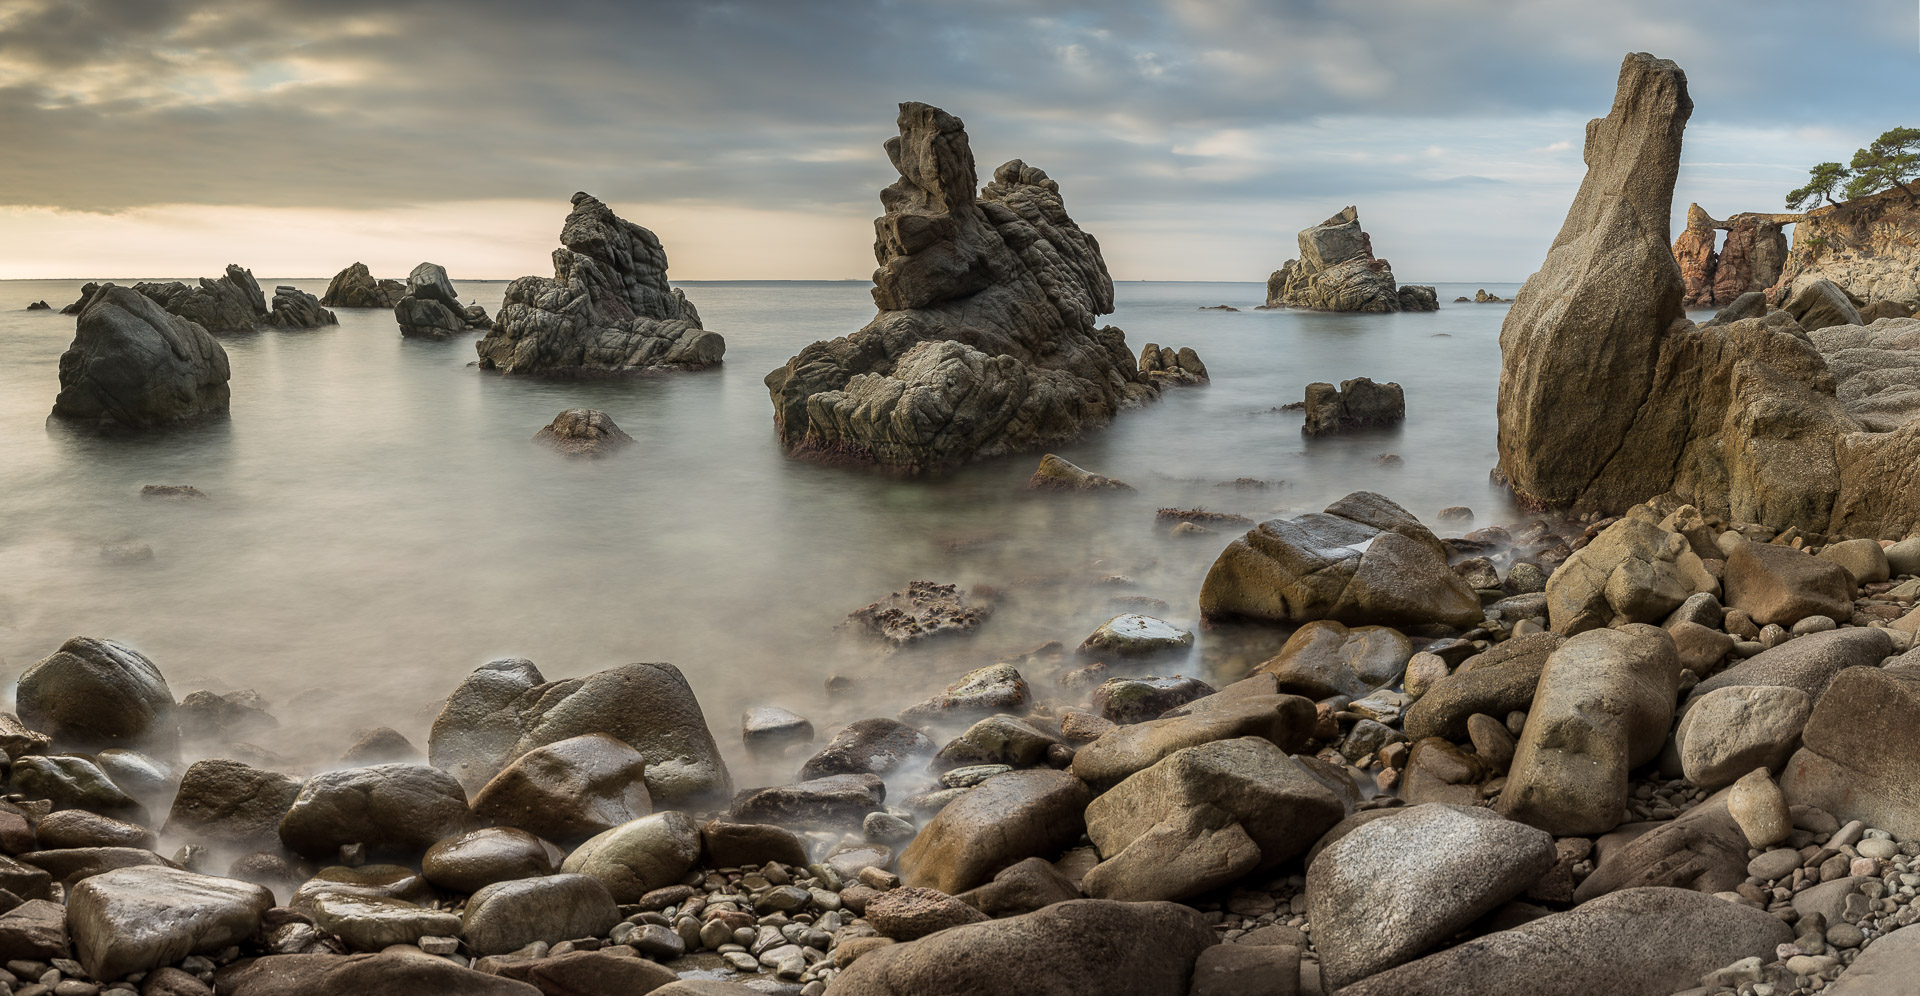 Fotografía de paisaje en Cala Frares panoramica, Lloret de Mar, filtro ND, larga exposición con Canon 6D,Danilatorre,danilatorre, Dani Latorre, daniel Latorre